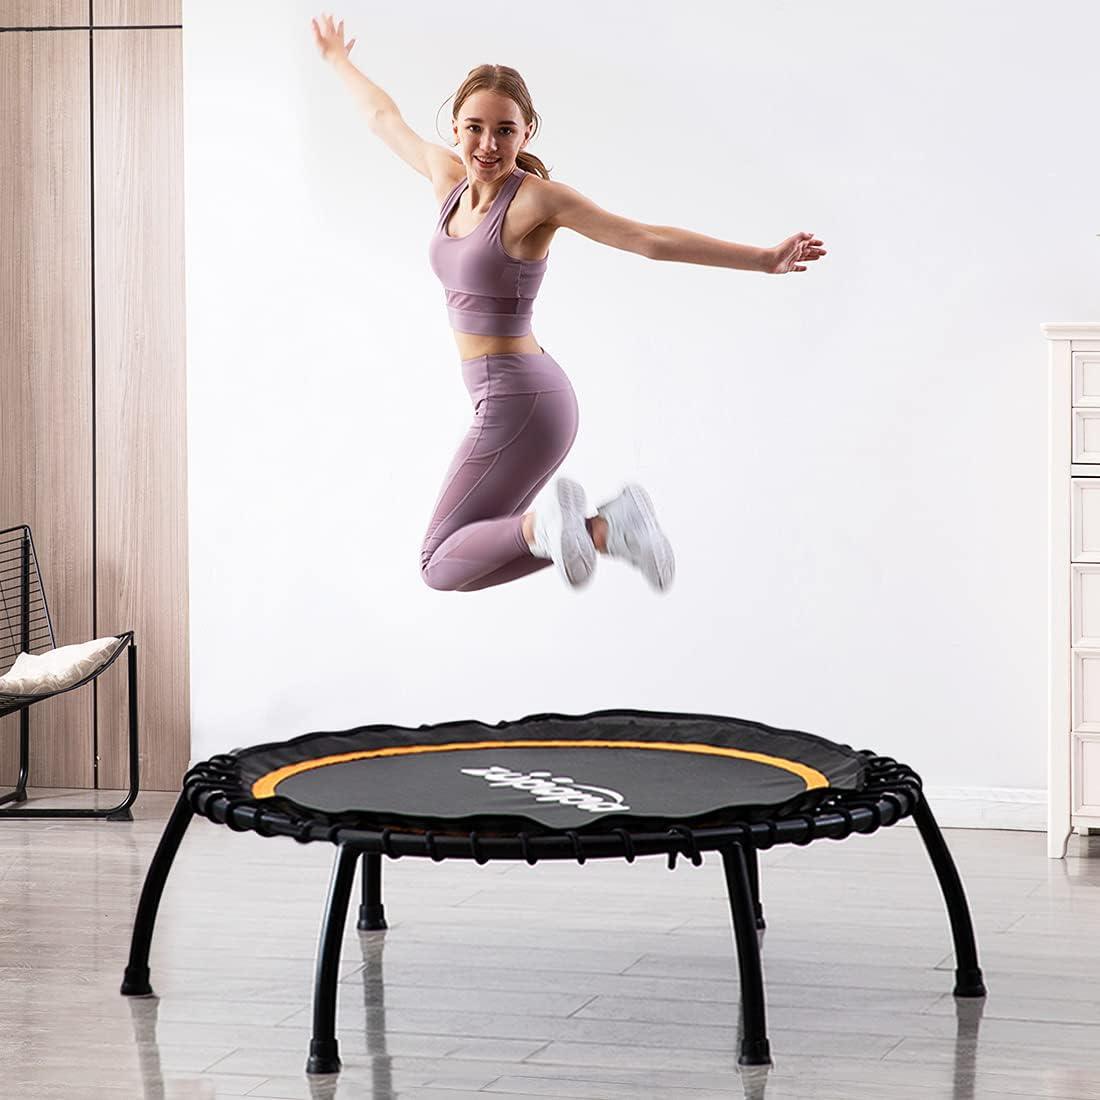 Zupapa Silent Mini Fitness Rebounder 2021 Trampoline– Super intense SALE for Indoor